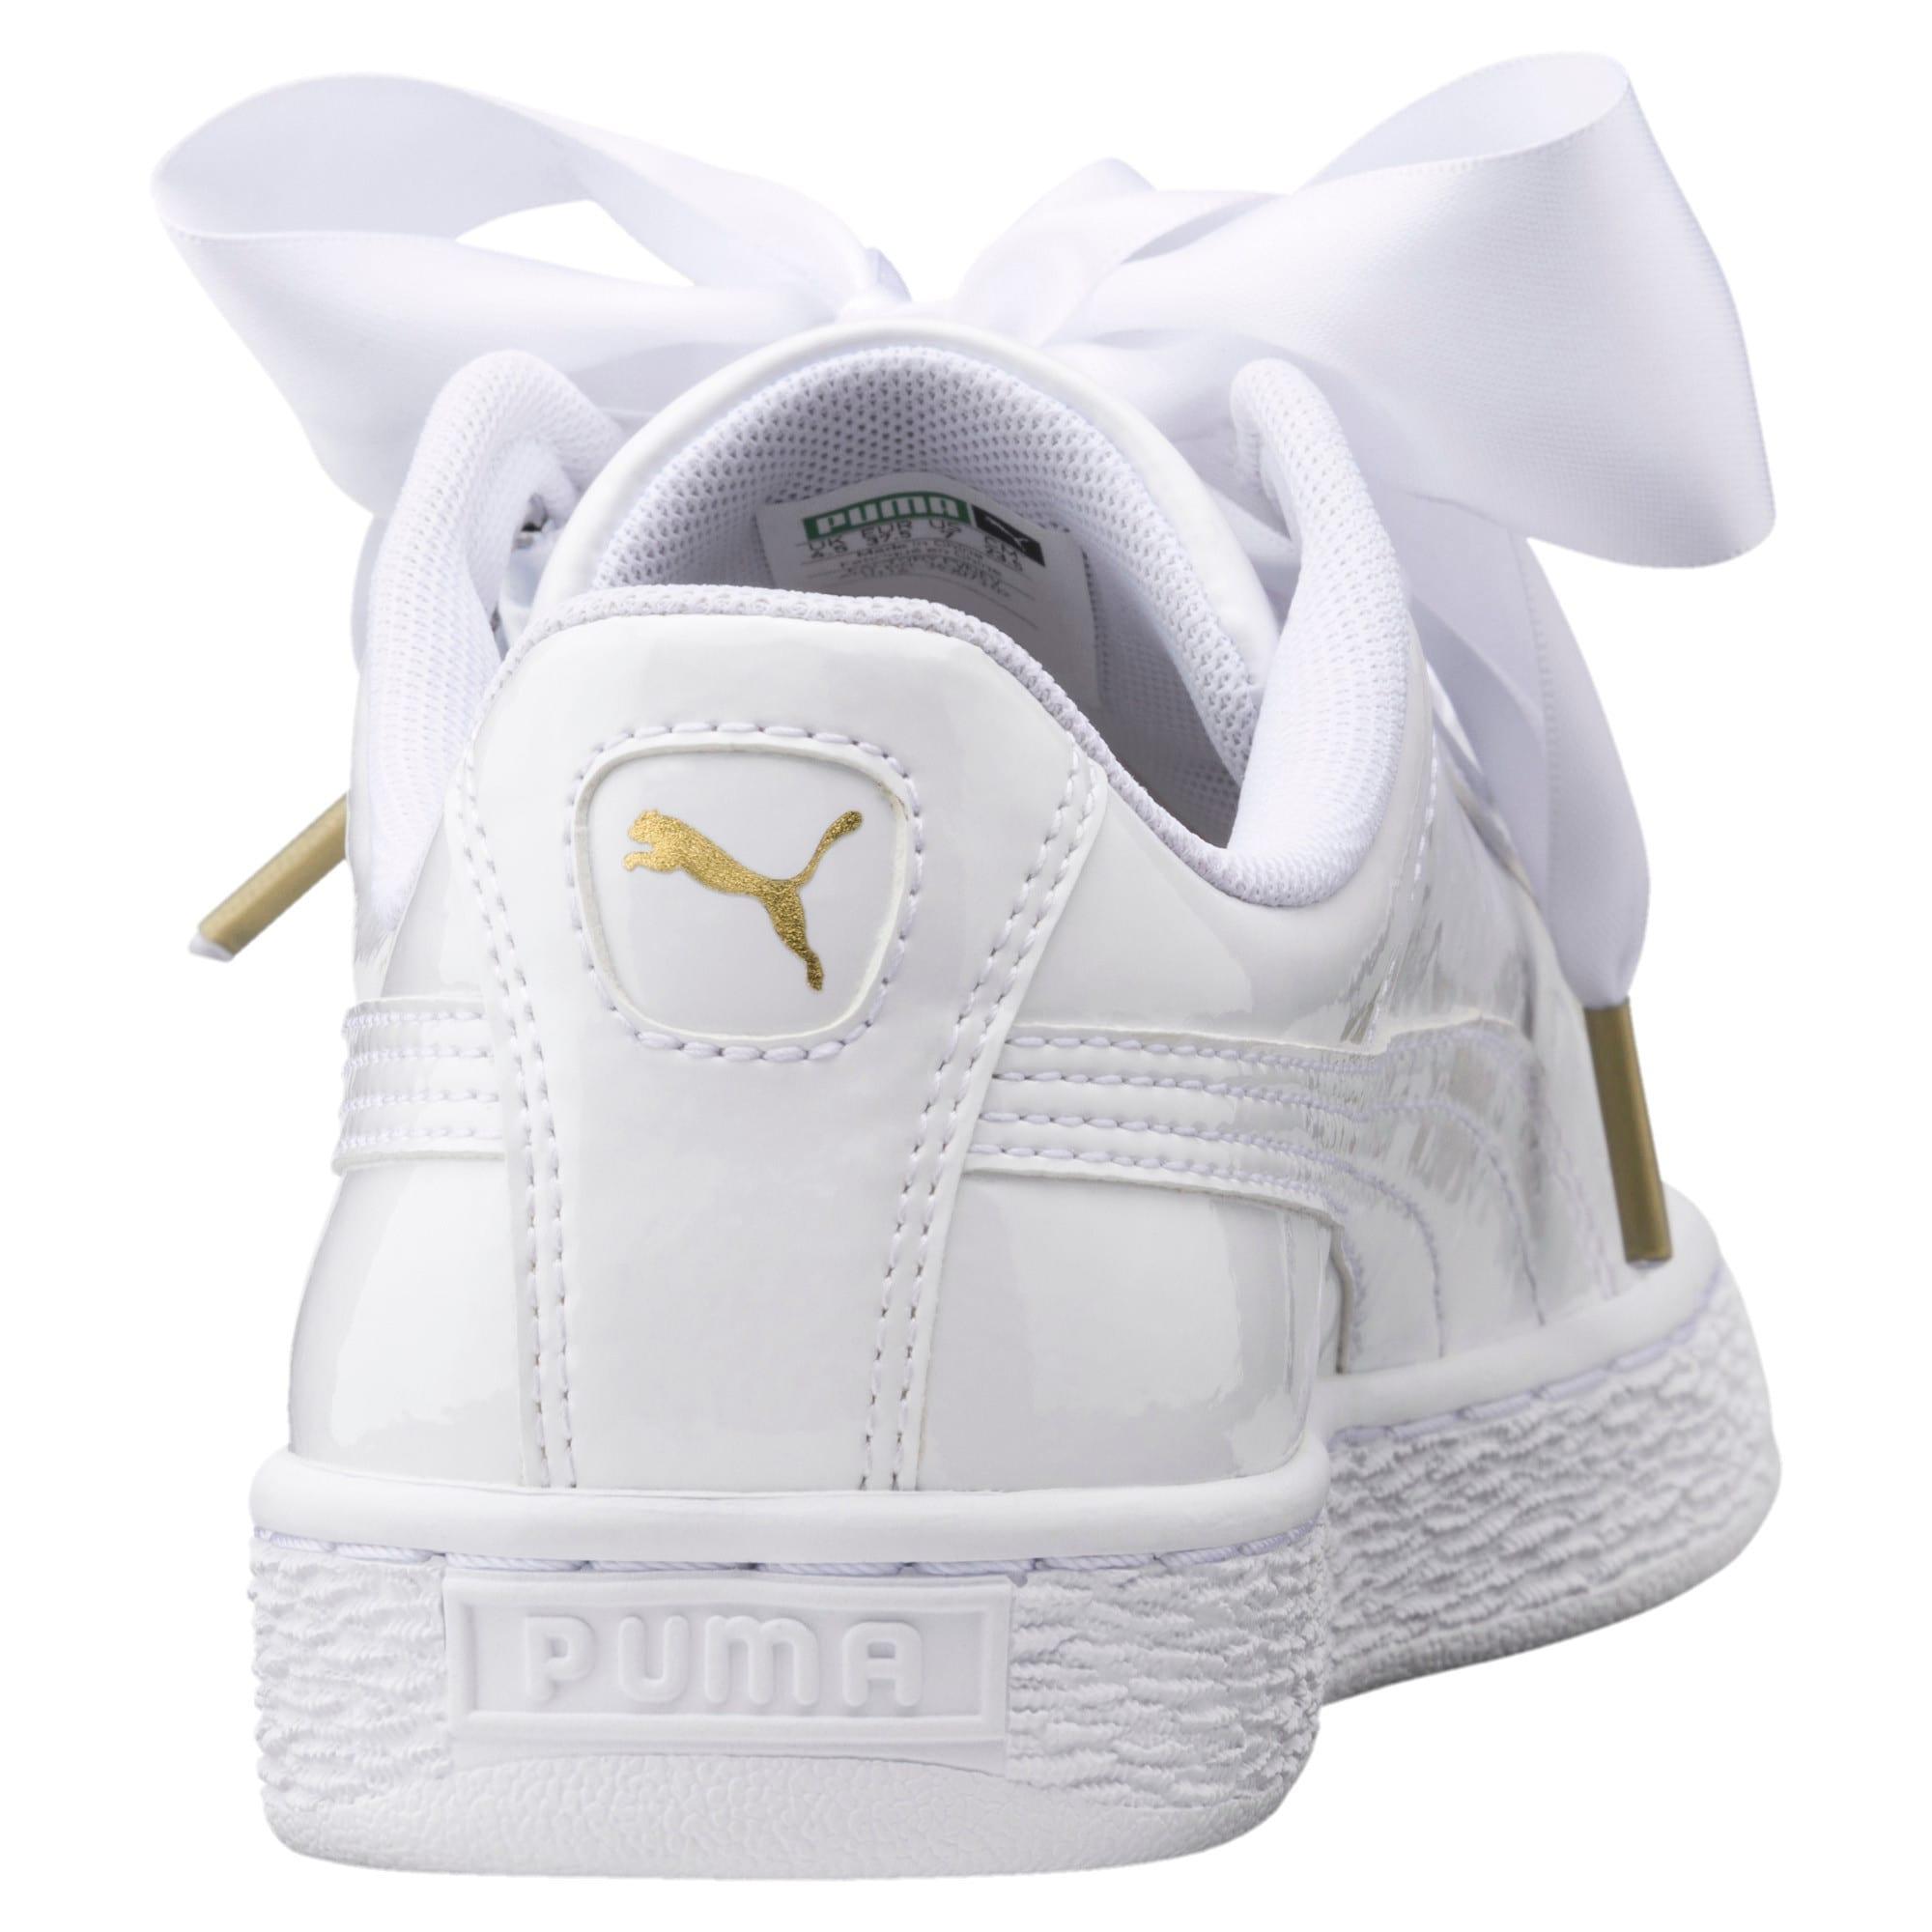 Thumbnail 4 of Basket Heart Patent Women's Trainers, Puma White-Puma White, medium-IND